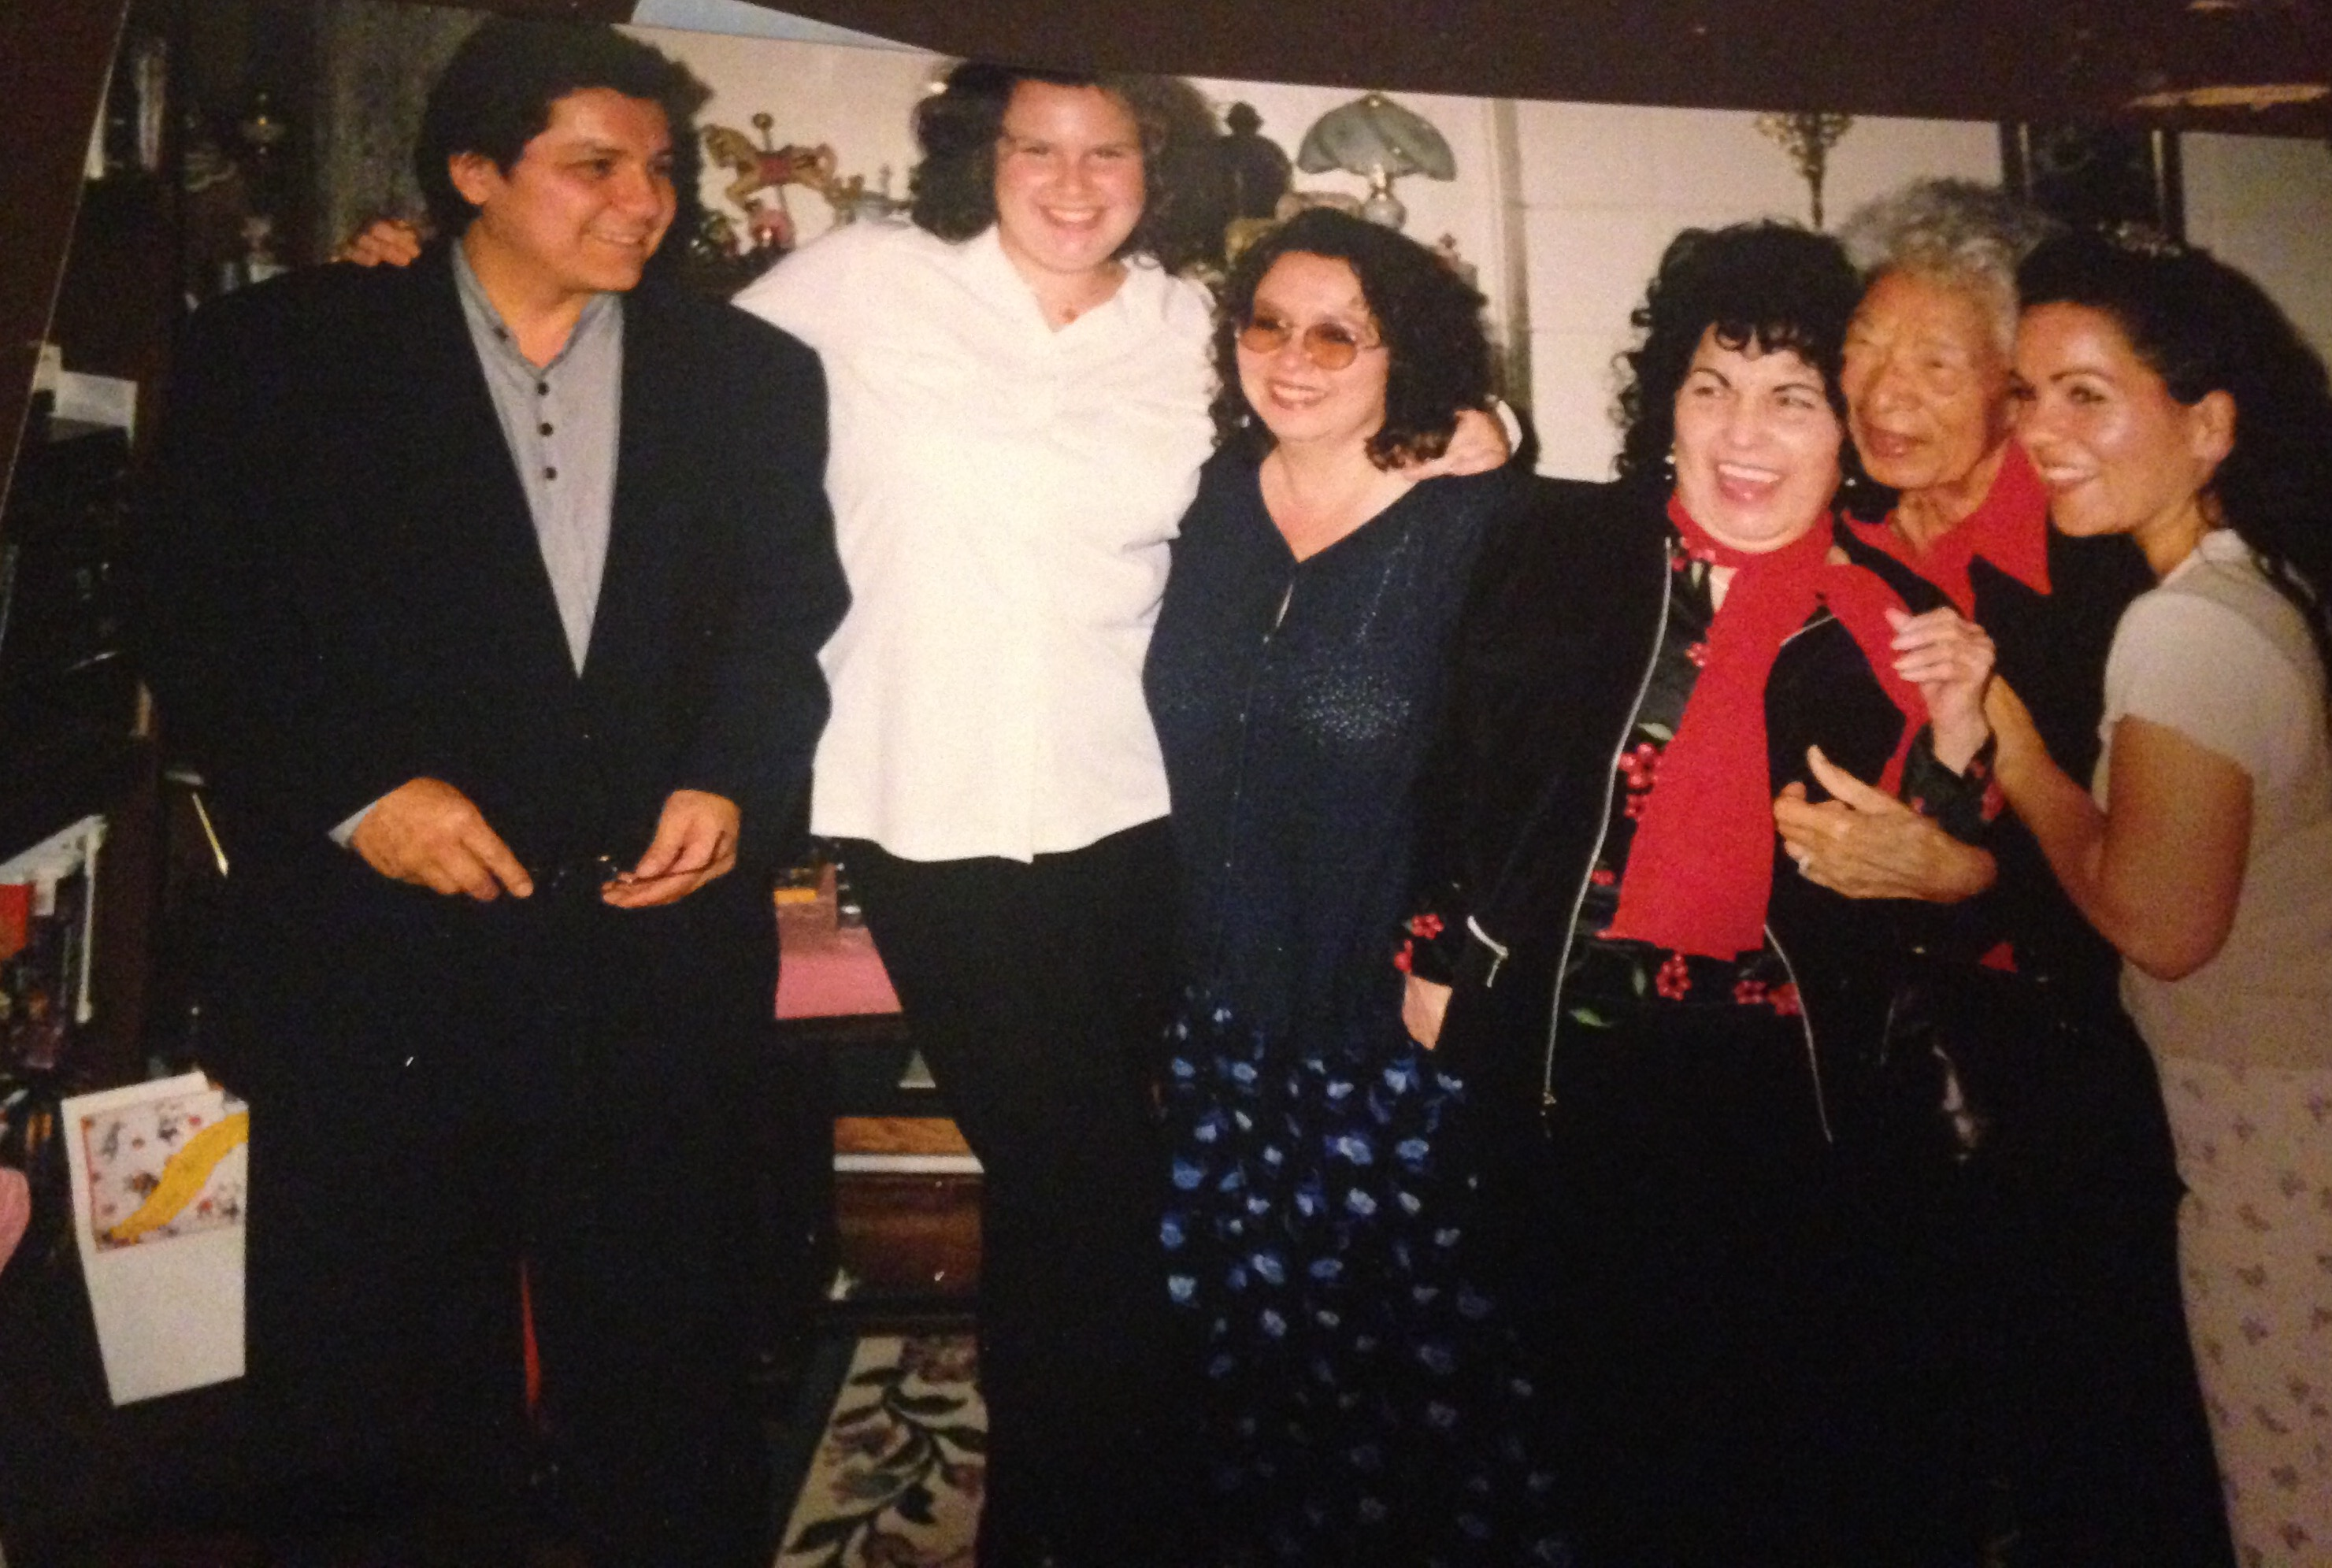 Sami, Samantha, Mom, A Grace, Connie